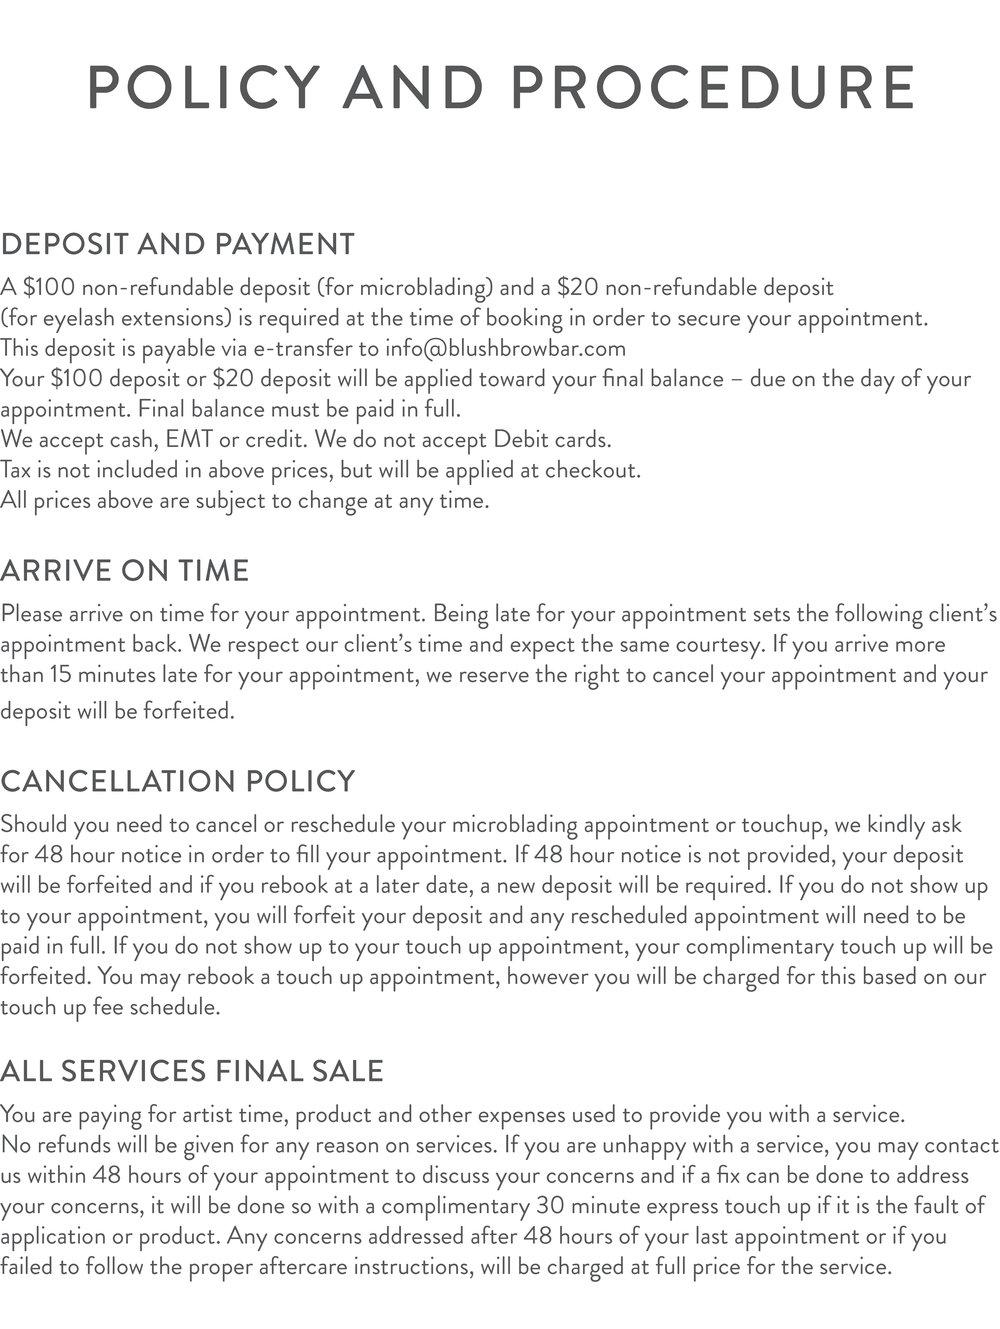 policy_2.jpg